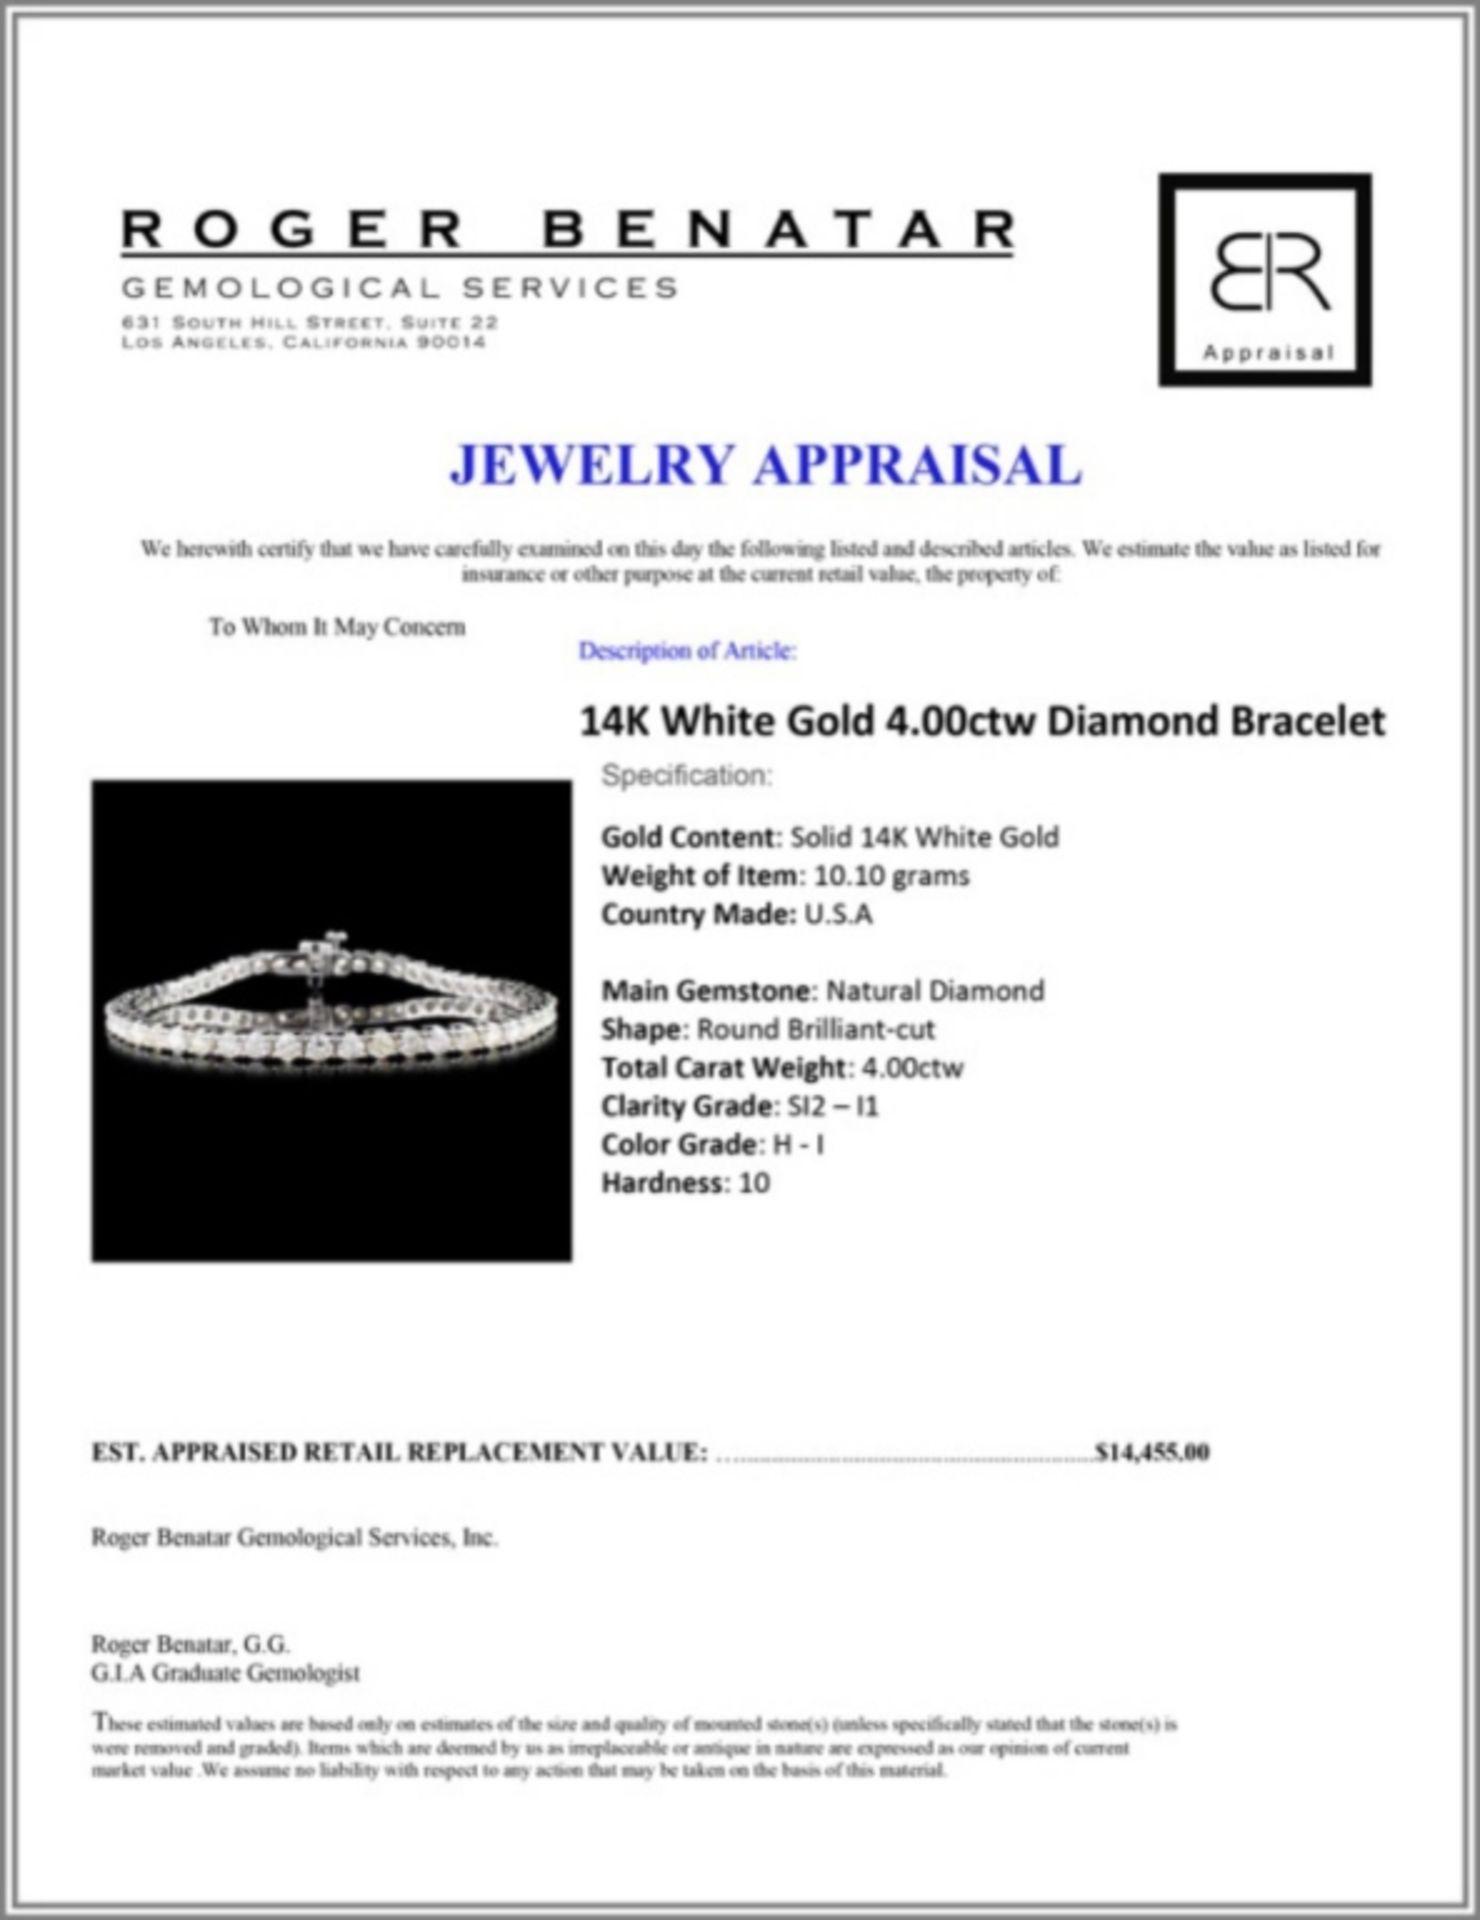 14K White Gold 4.00ctw Diamond Bracelet - Image 3 of 3